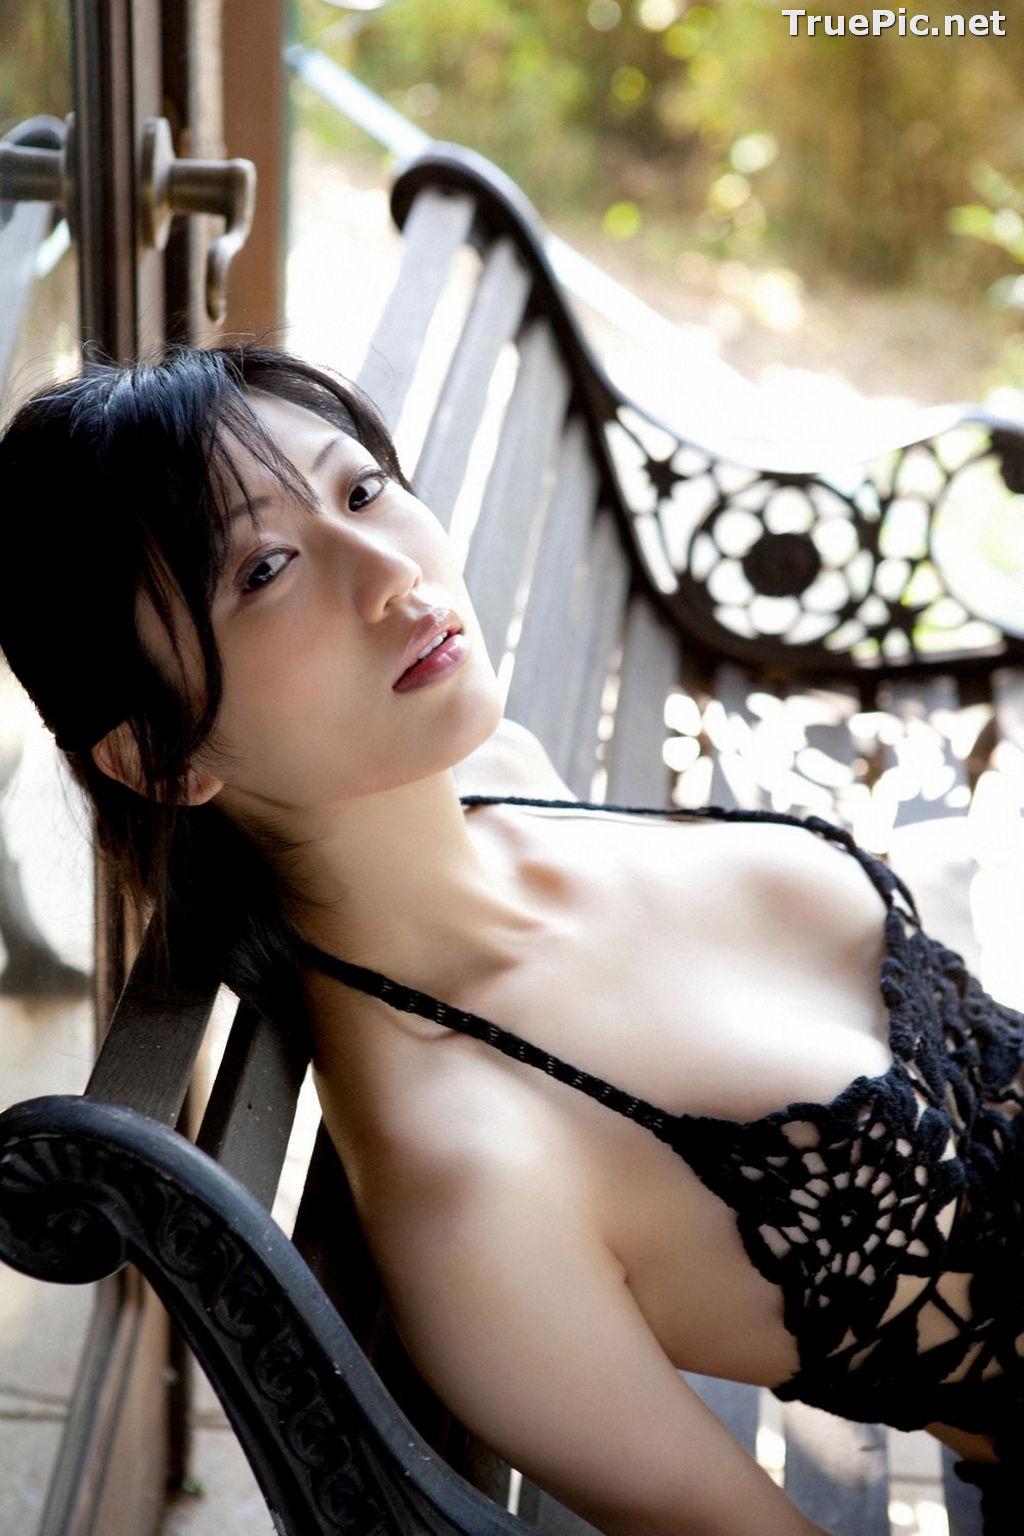 Image [YS Web] Vol.525 - Japanese Actress and Gravure Idol - Mitsu Dan - TruePic.net - Picture-8